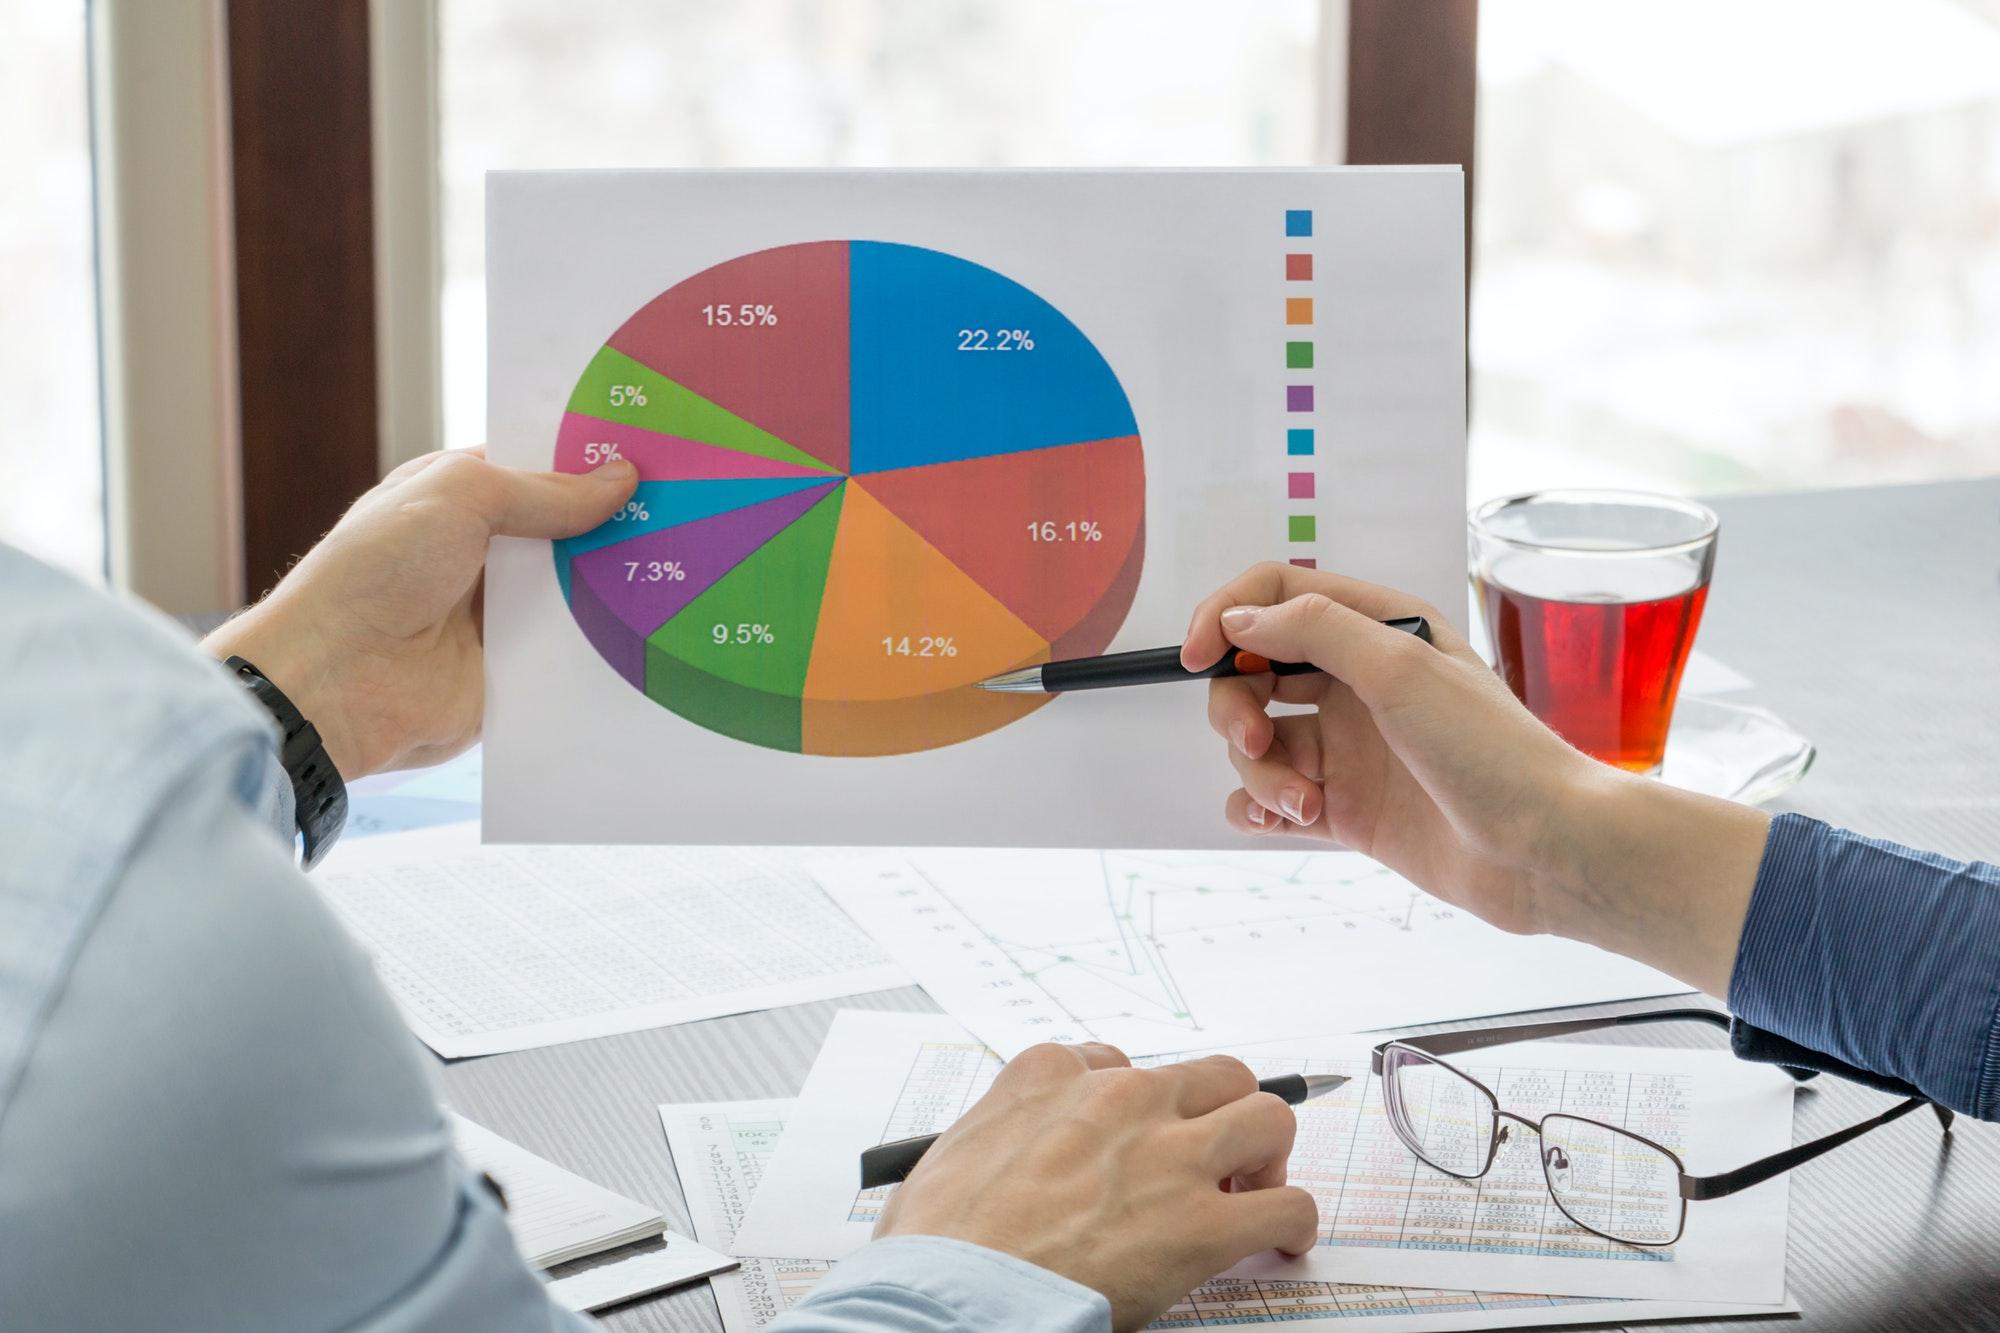 planning, finance and statistics